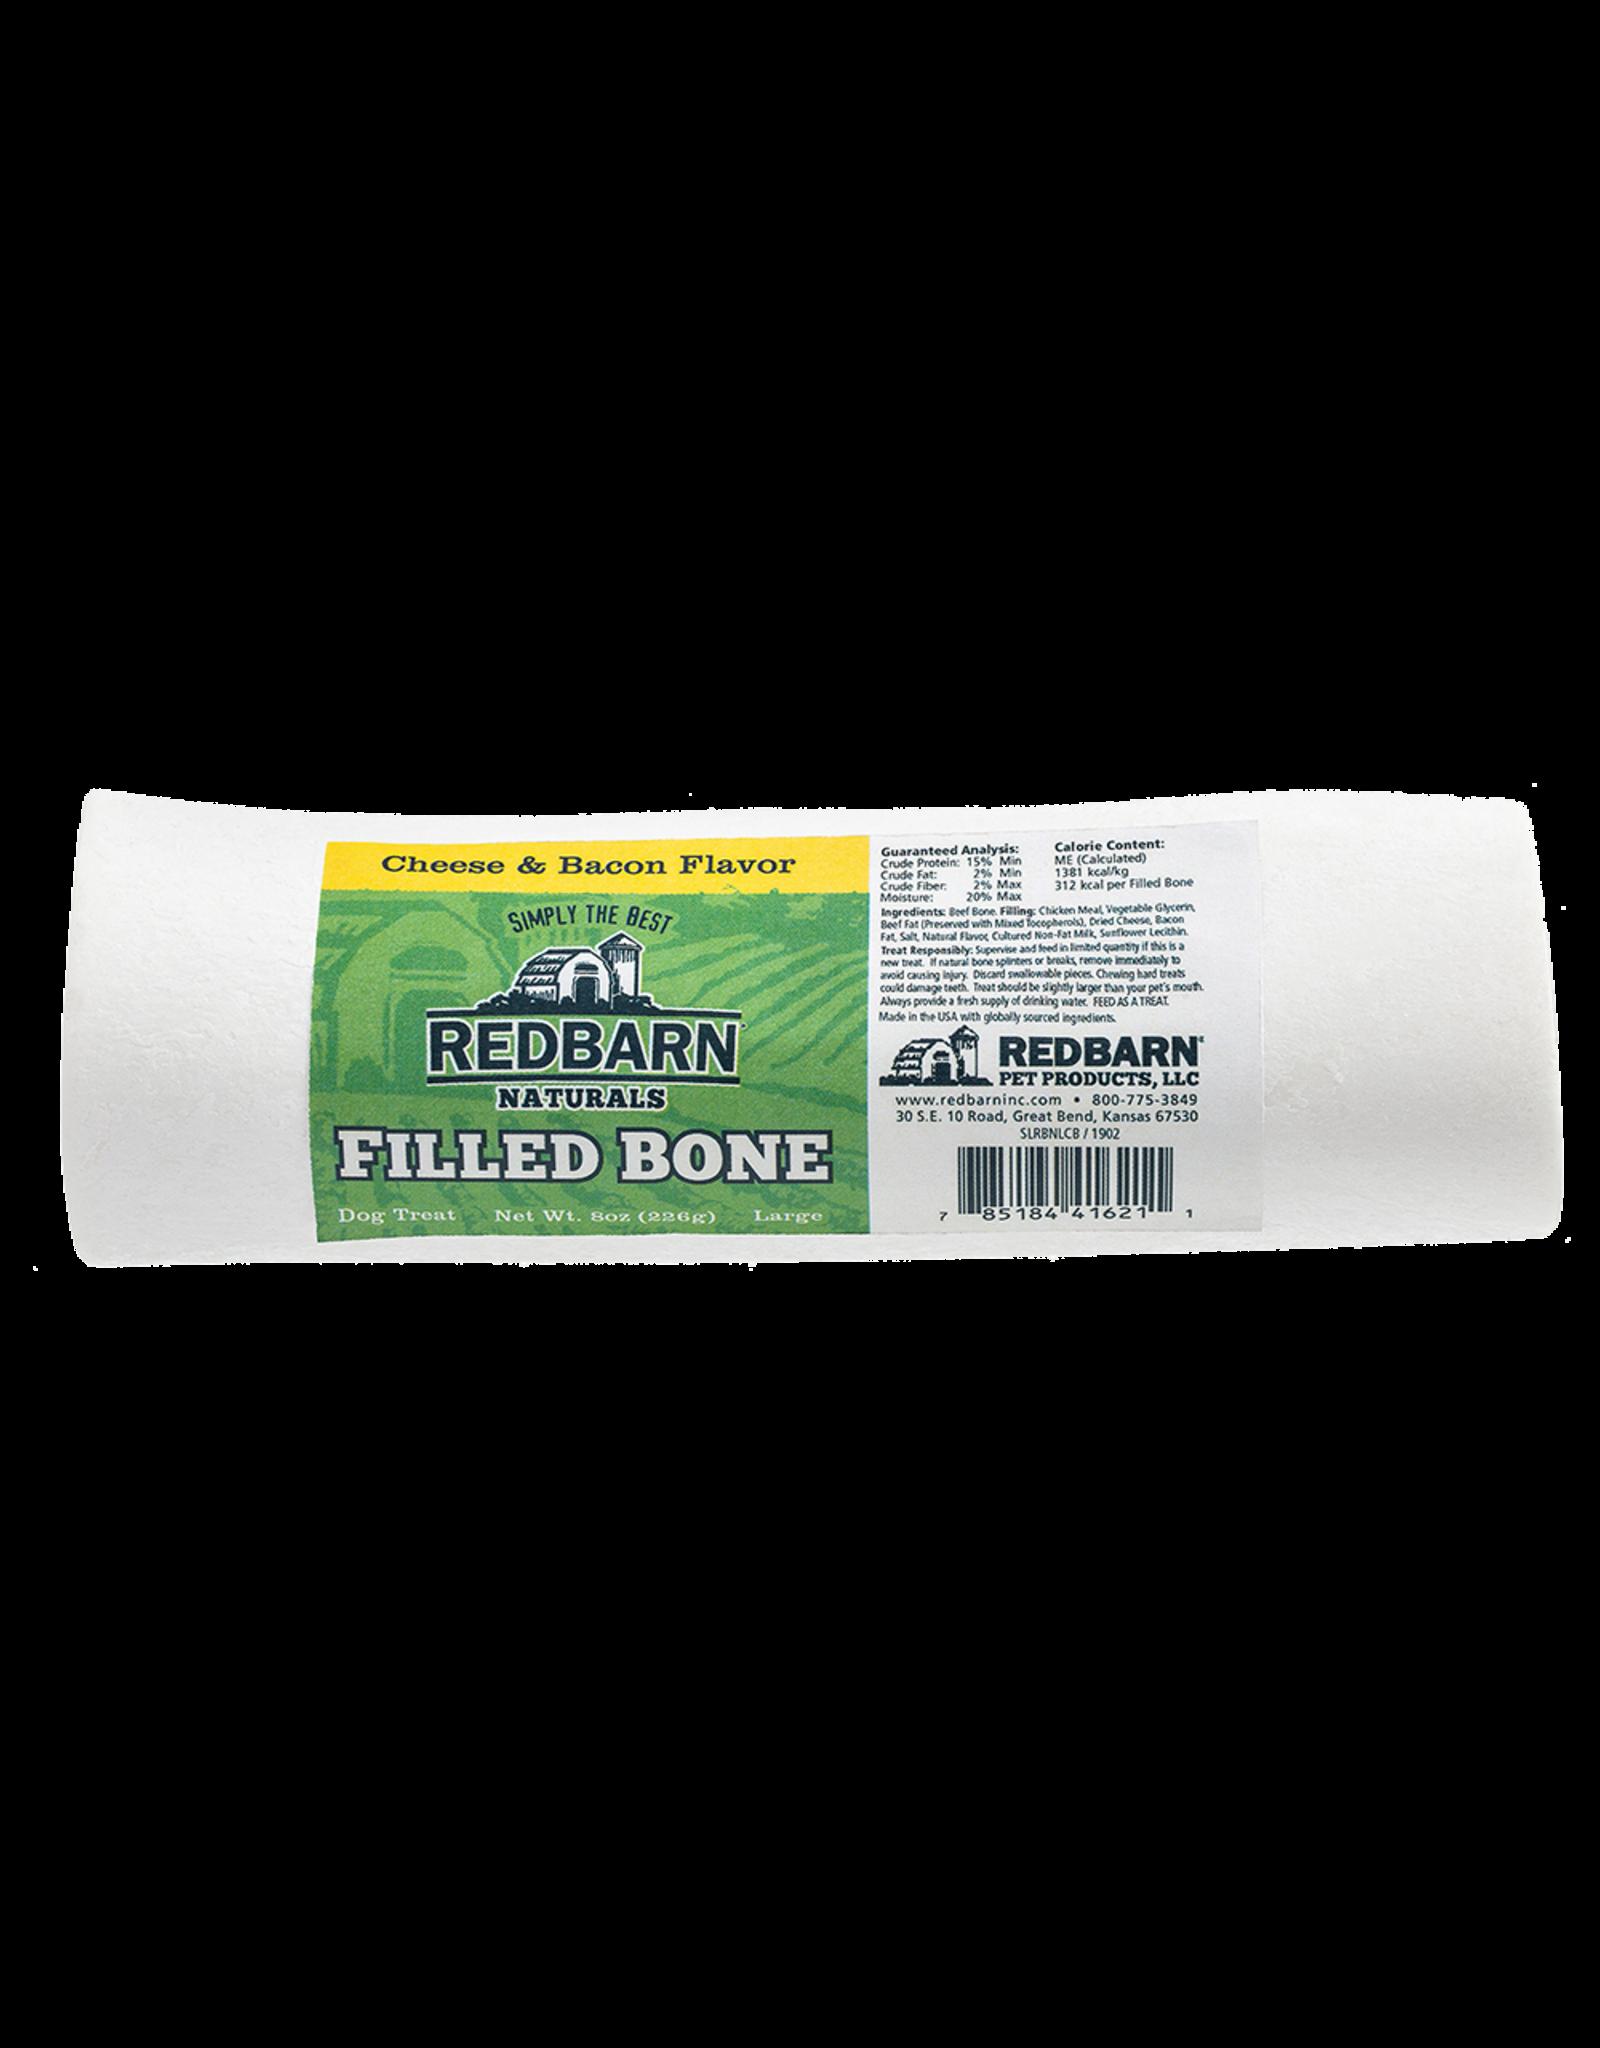 Redbarn Redbarn Filled Bones Cheese & Bacon Dog Chew